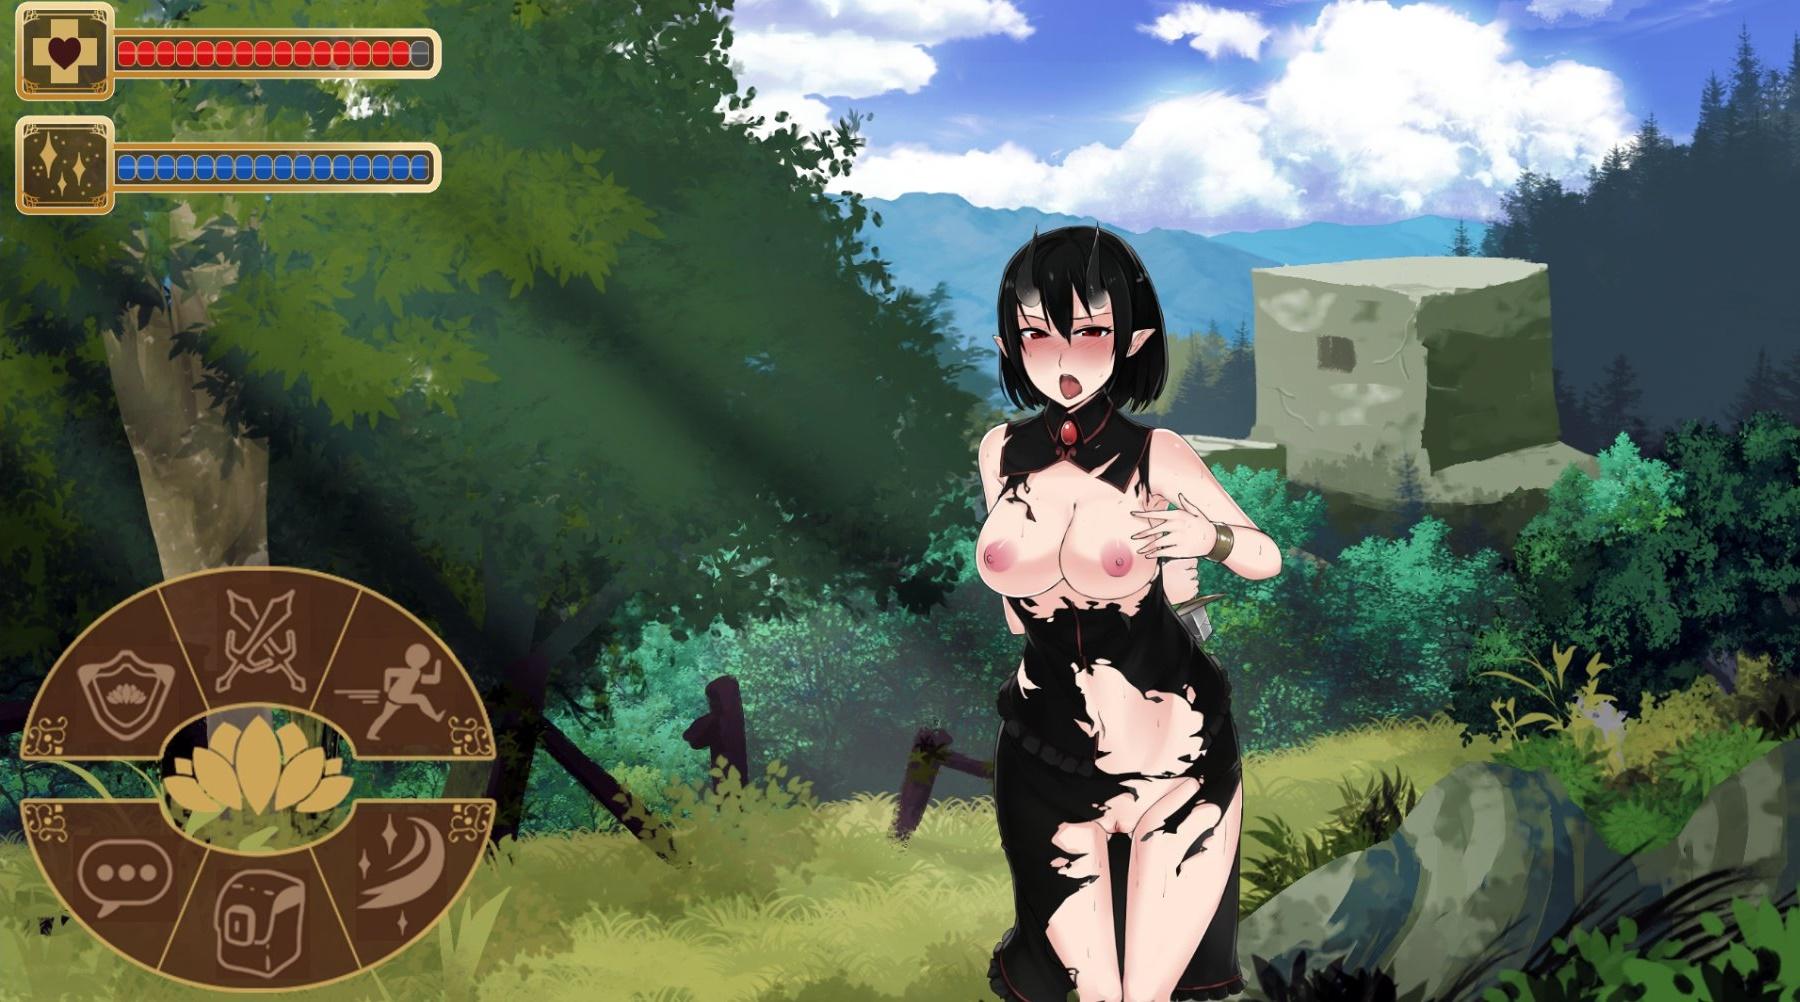 Hentai Game Review Karma Sutra - Hentai Reviews-7420